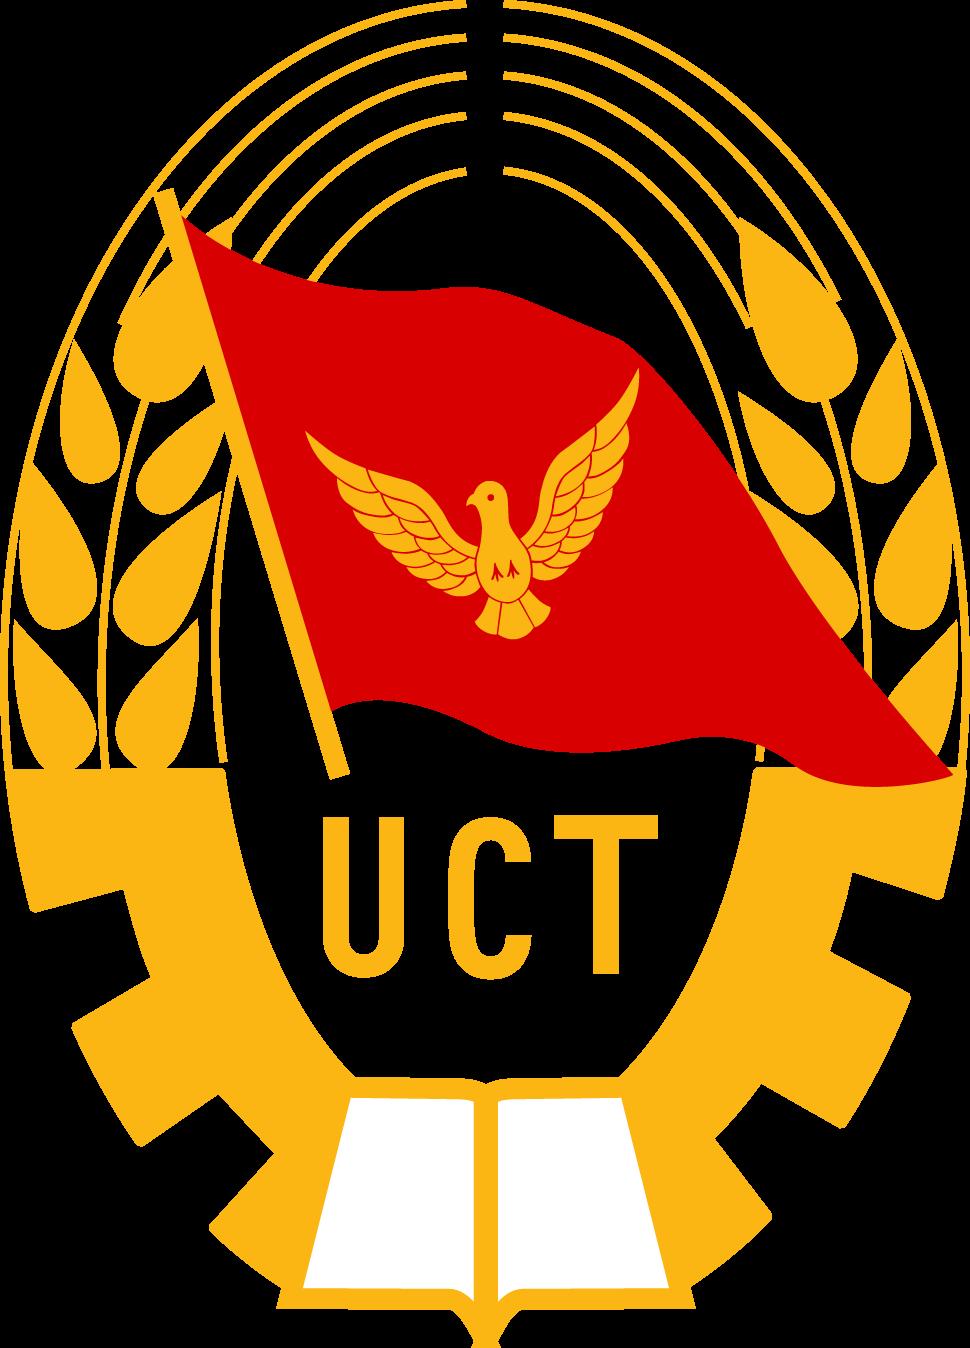 Emblem of the UCT